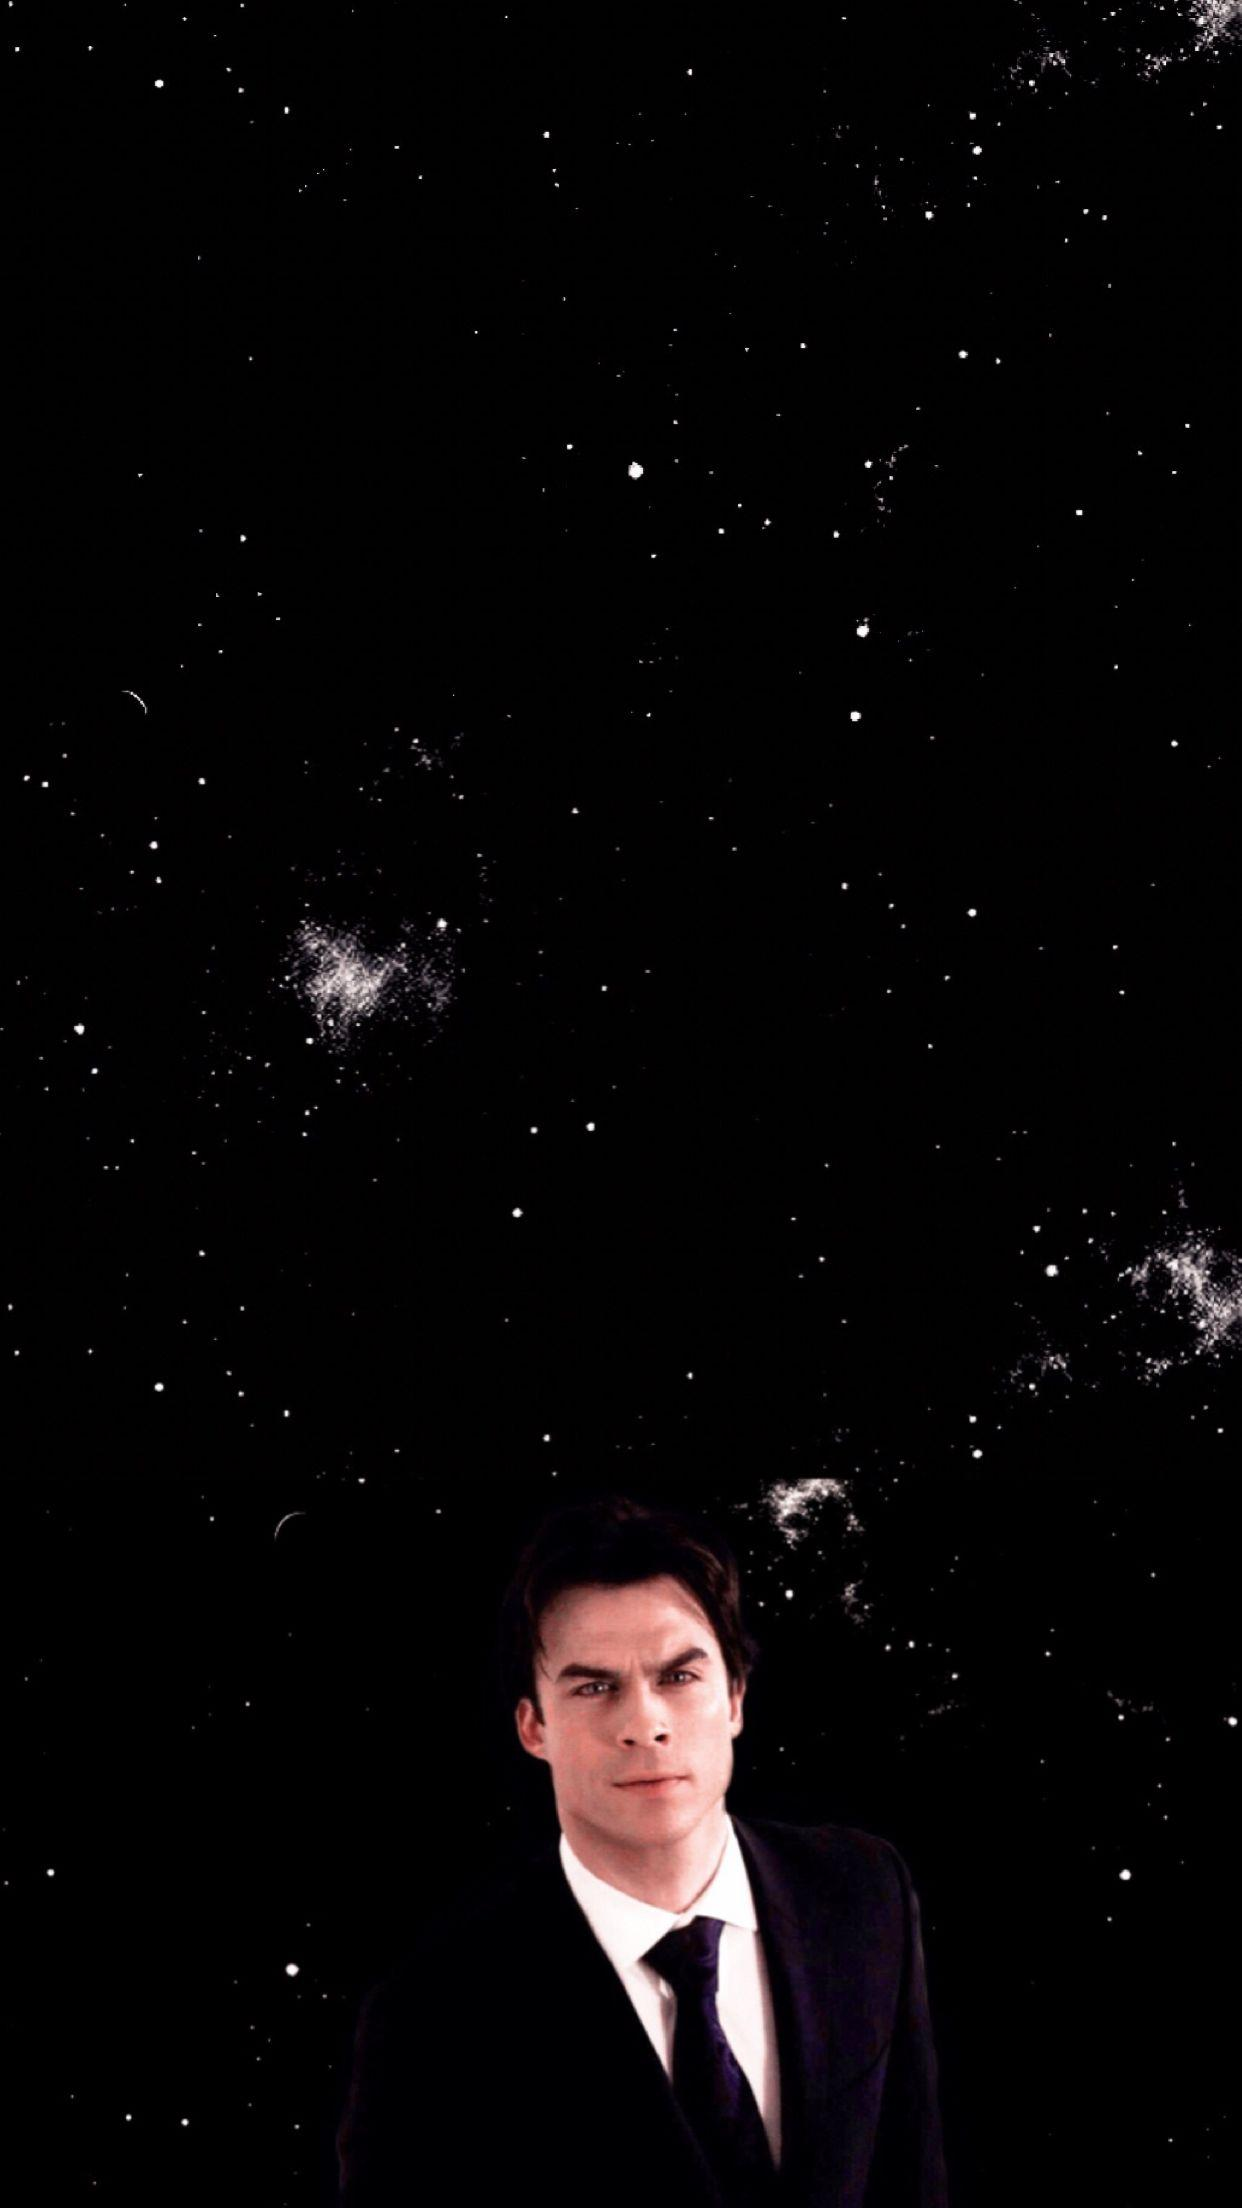 Damon Salvatore Tumblr Wallpapers Wallpaper Cave